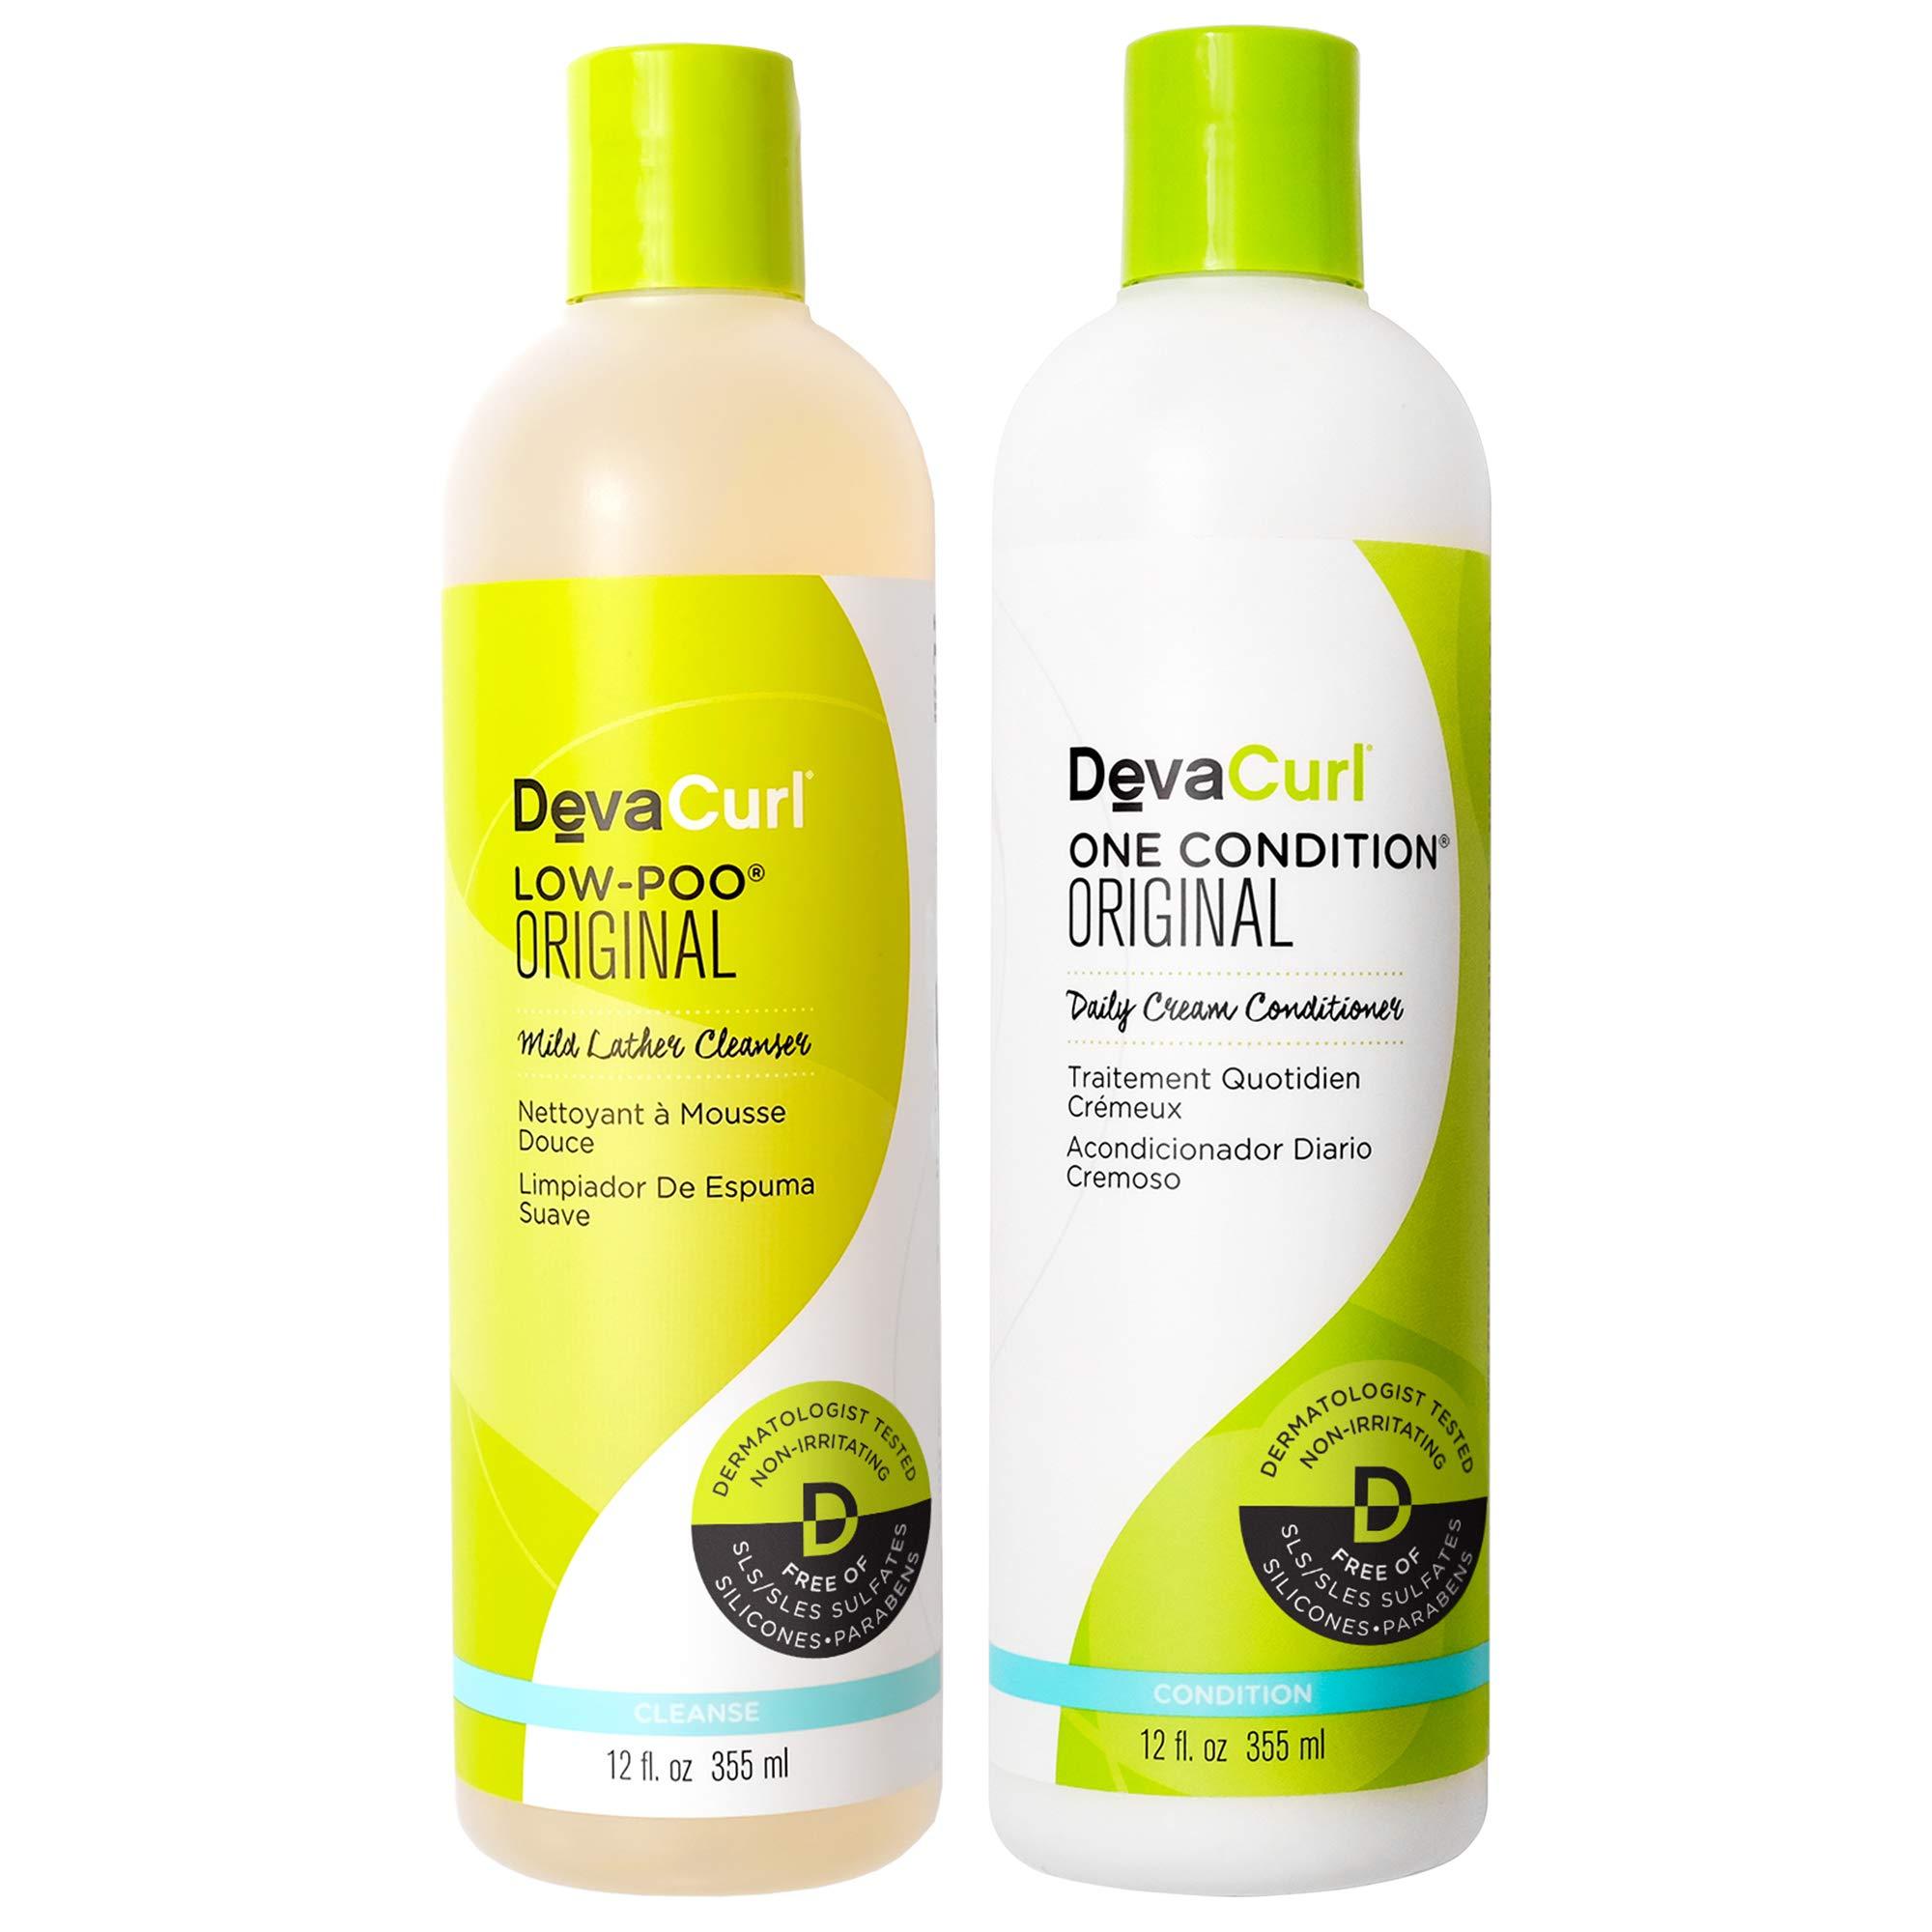 DevaCurl Low-Poo Original 12oz + One Condition Original 12oz Combo